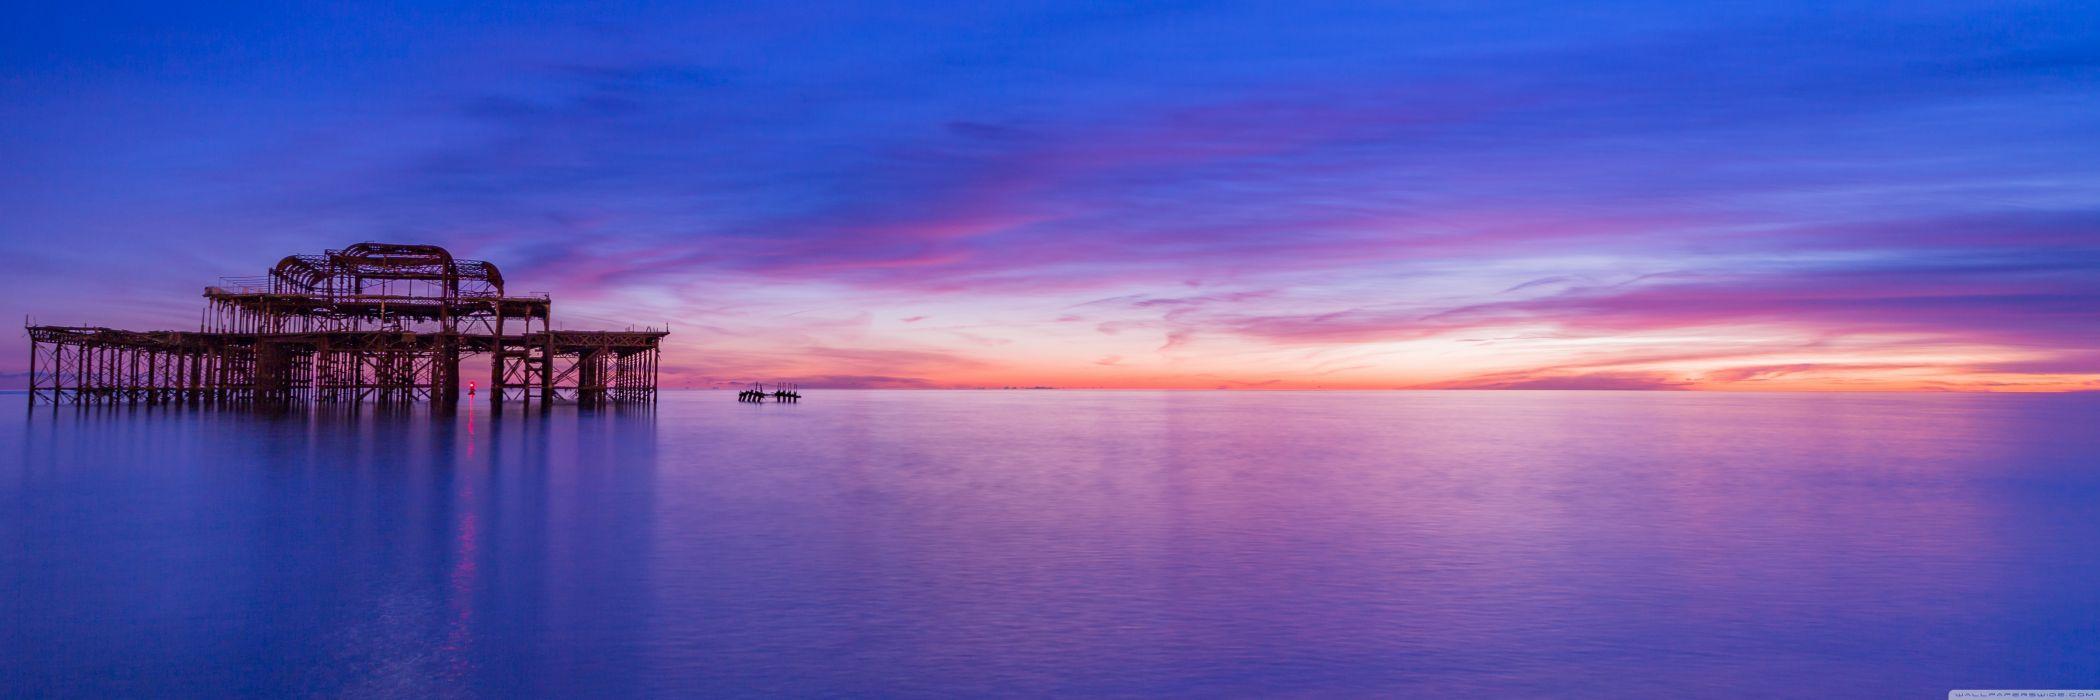 brighton pier sunset- unitedkingdom brighton landscape water sunset ocean sky clouds beach nature city night wallpaper